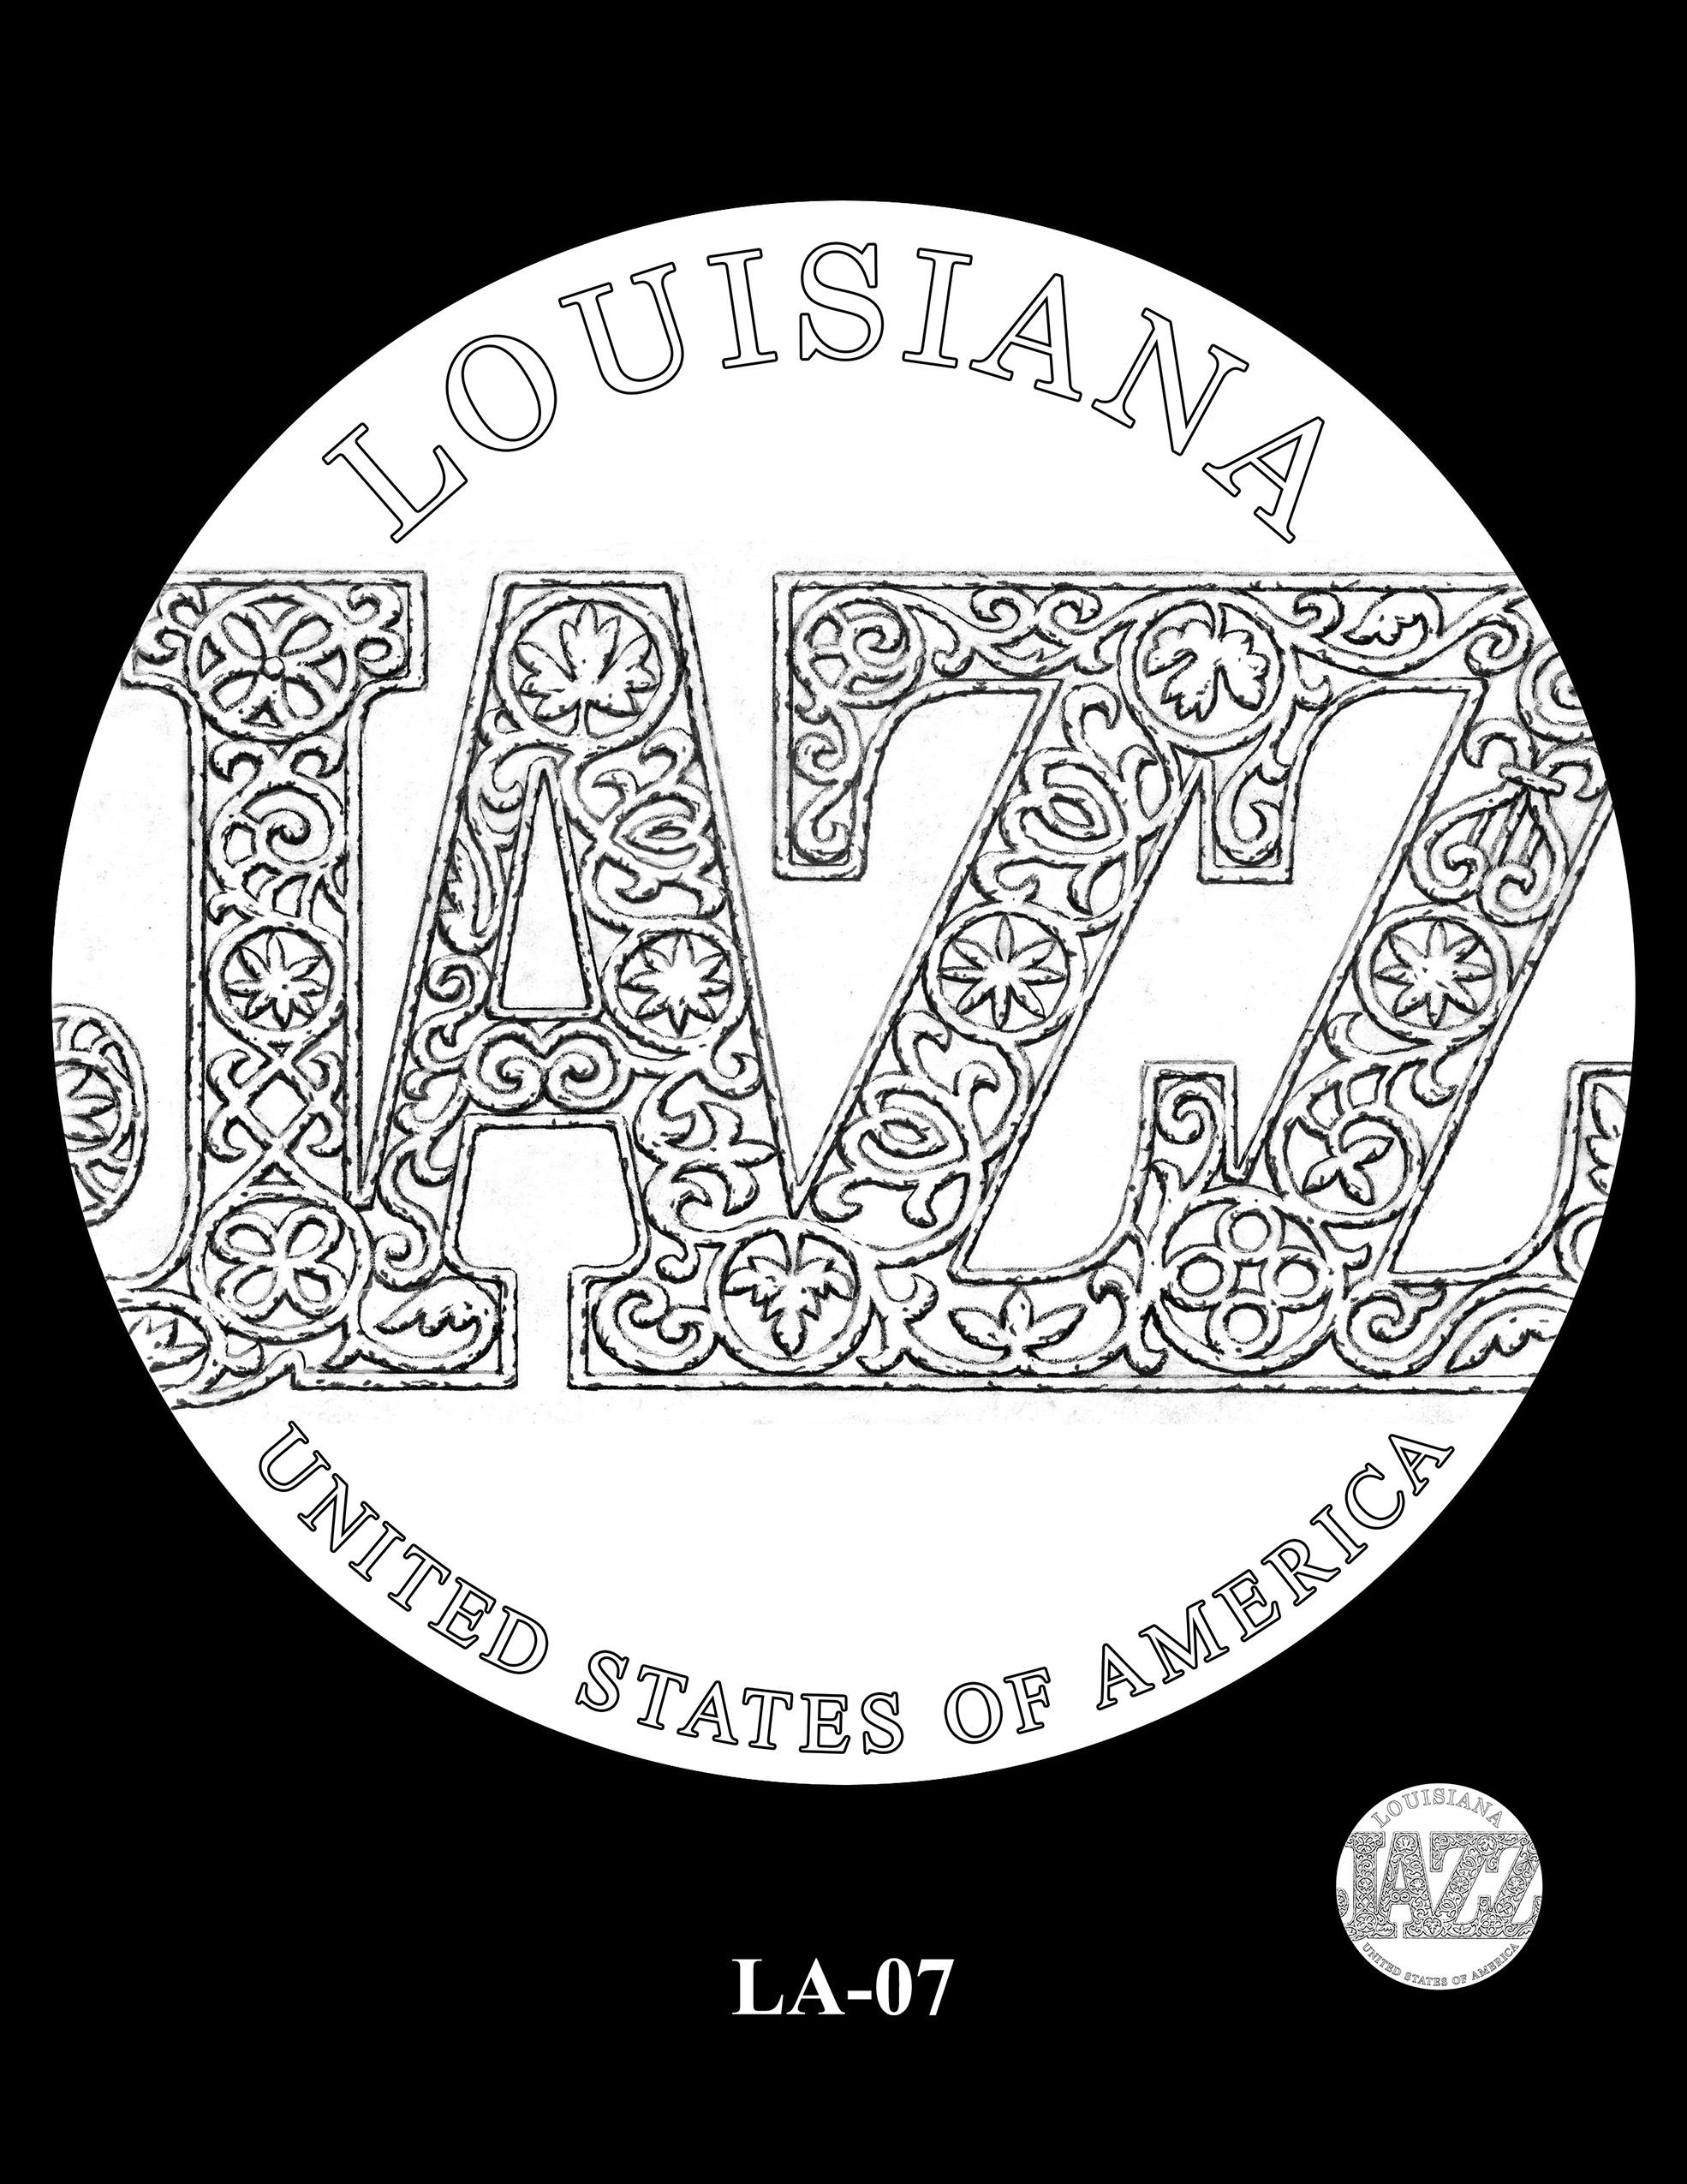 LA-07 -- 2023 American Innovation $1 Coin Program - Louisiana